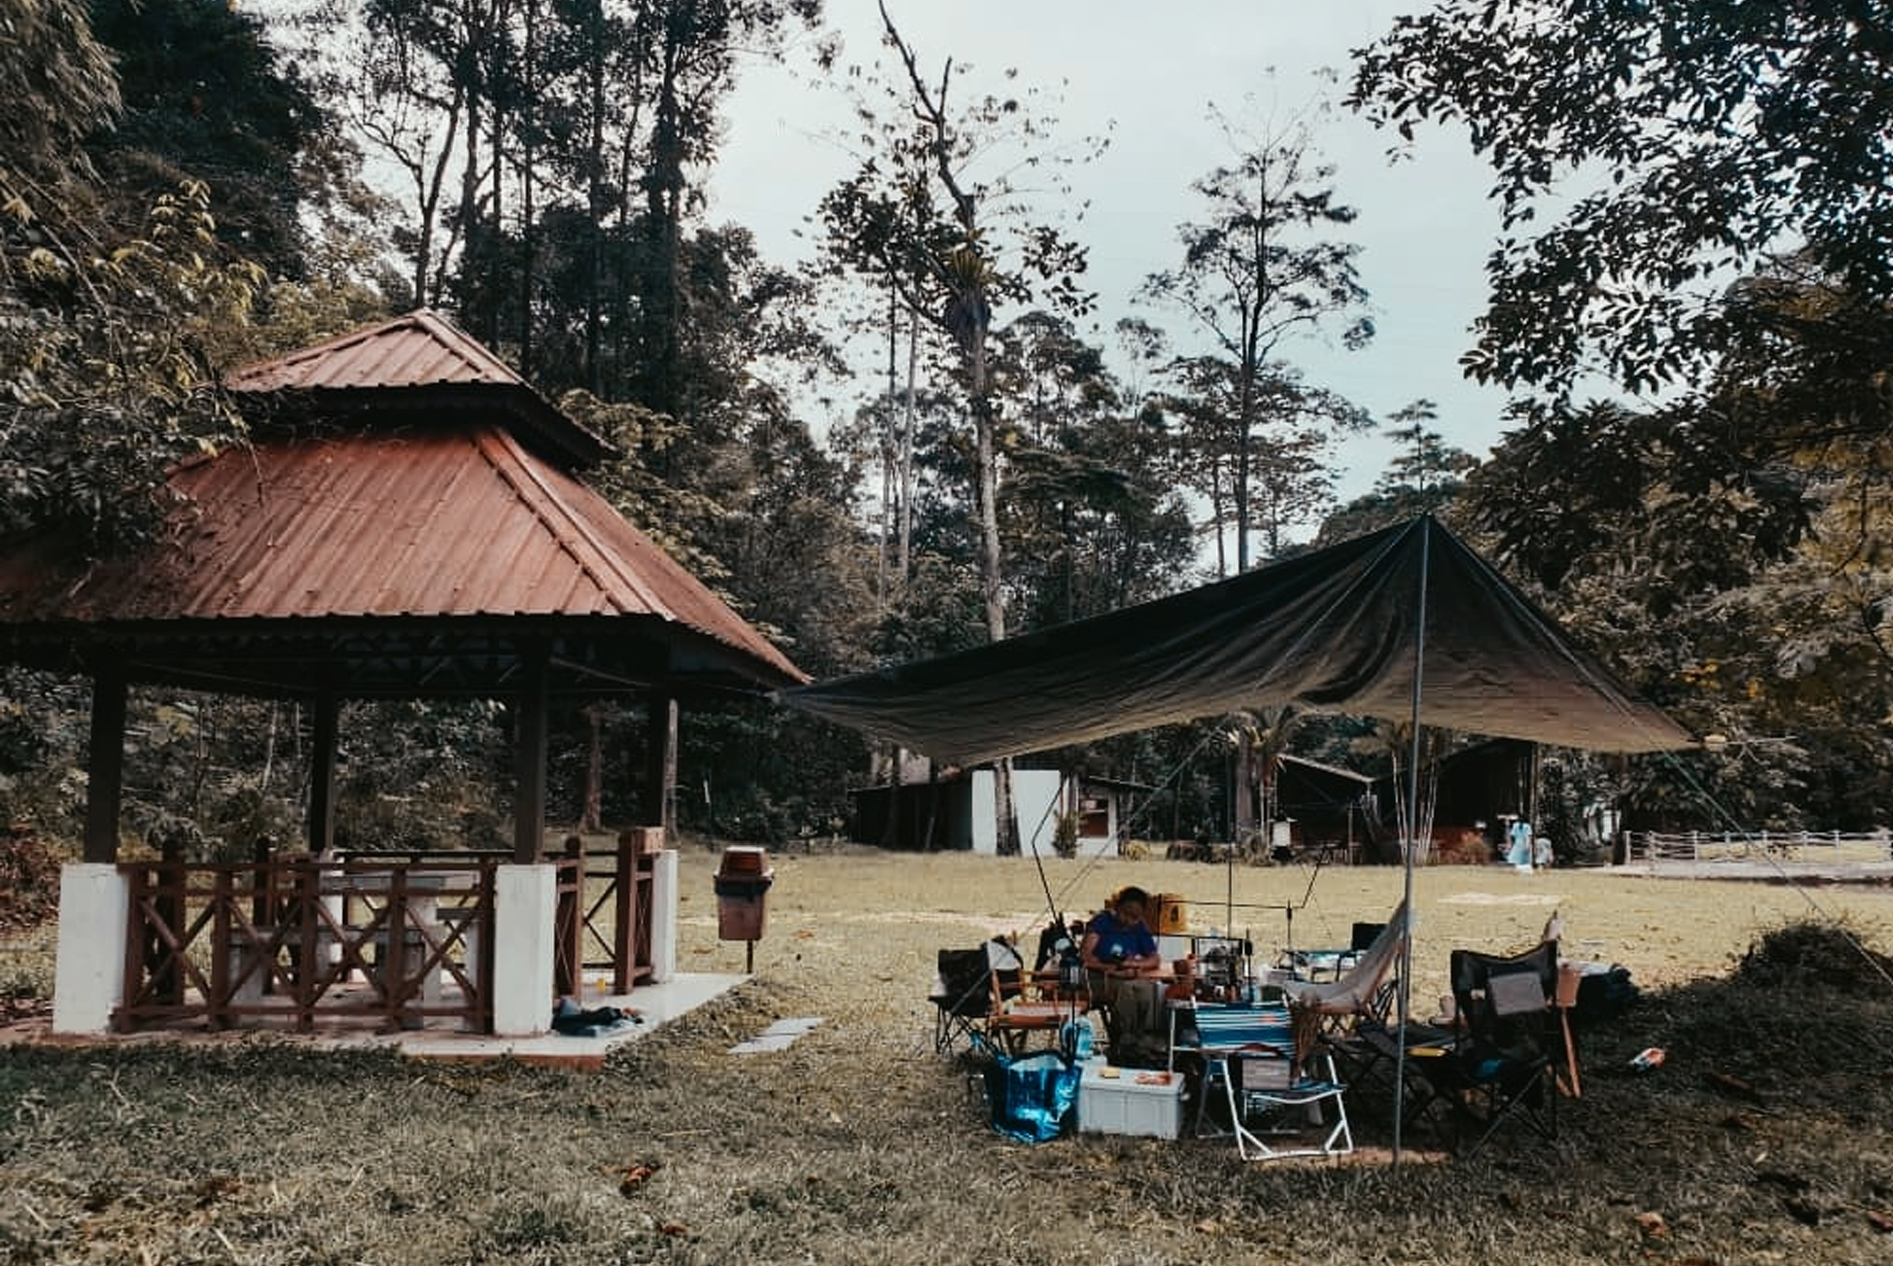 Resort_Taman_Rimba_Komanwel_Rawang_campsite_malaysia_car_camping_private_event_organizer-34